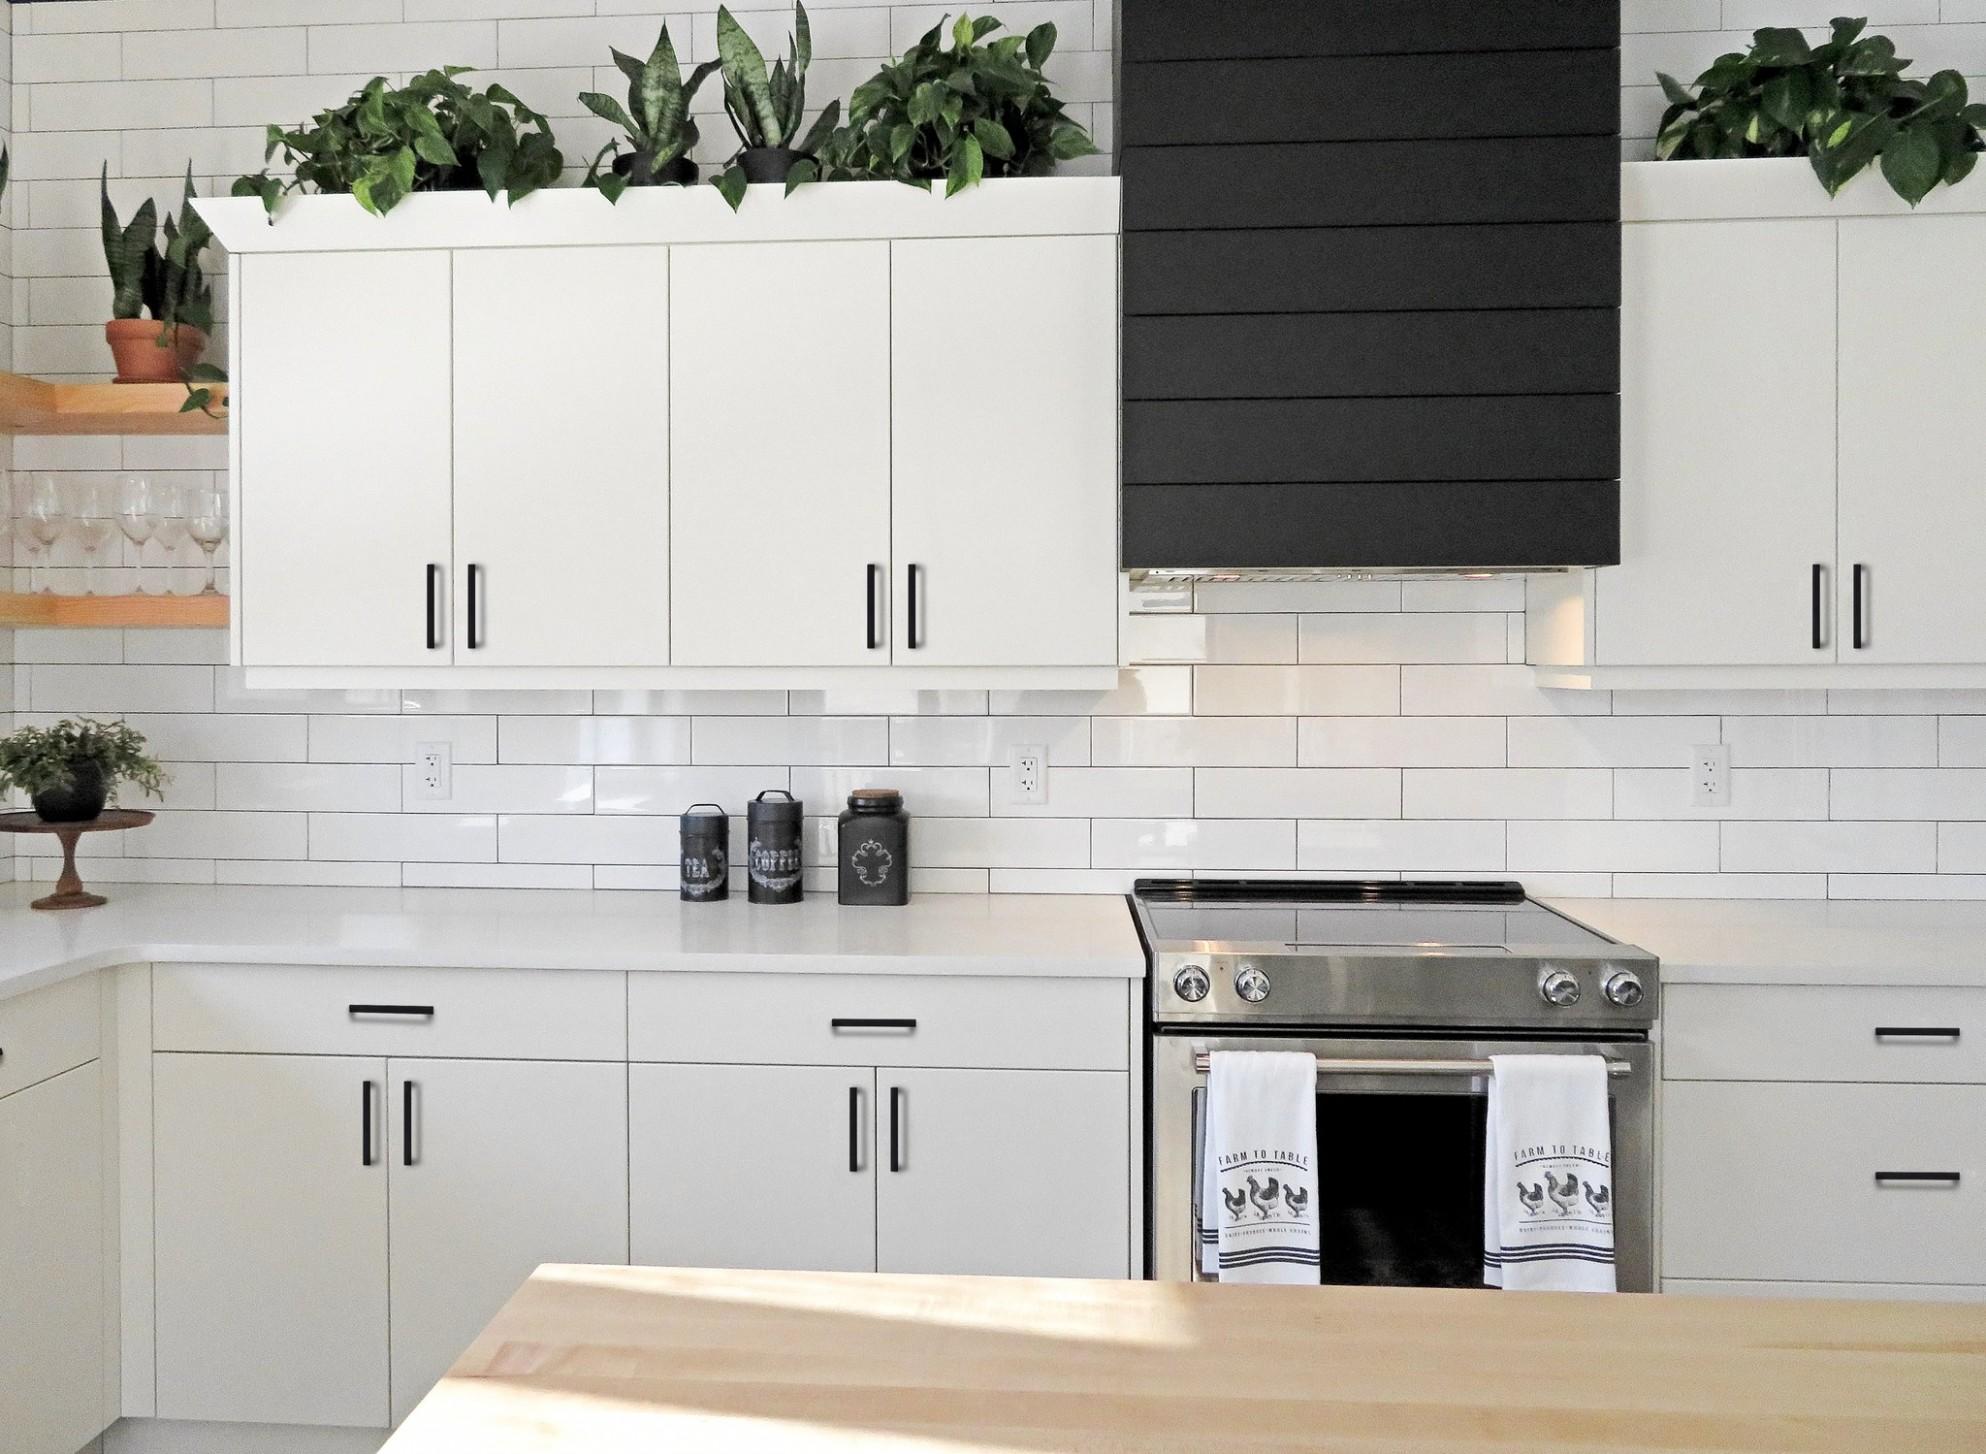 Ravinte 11 Pack 11 Inch Kitchen Square Cabinet Handles Matte Black Cabi - Matte Black Kitchen Cabinet Hardware